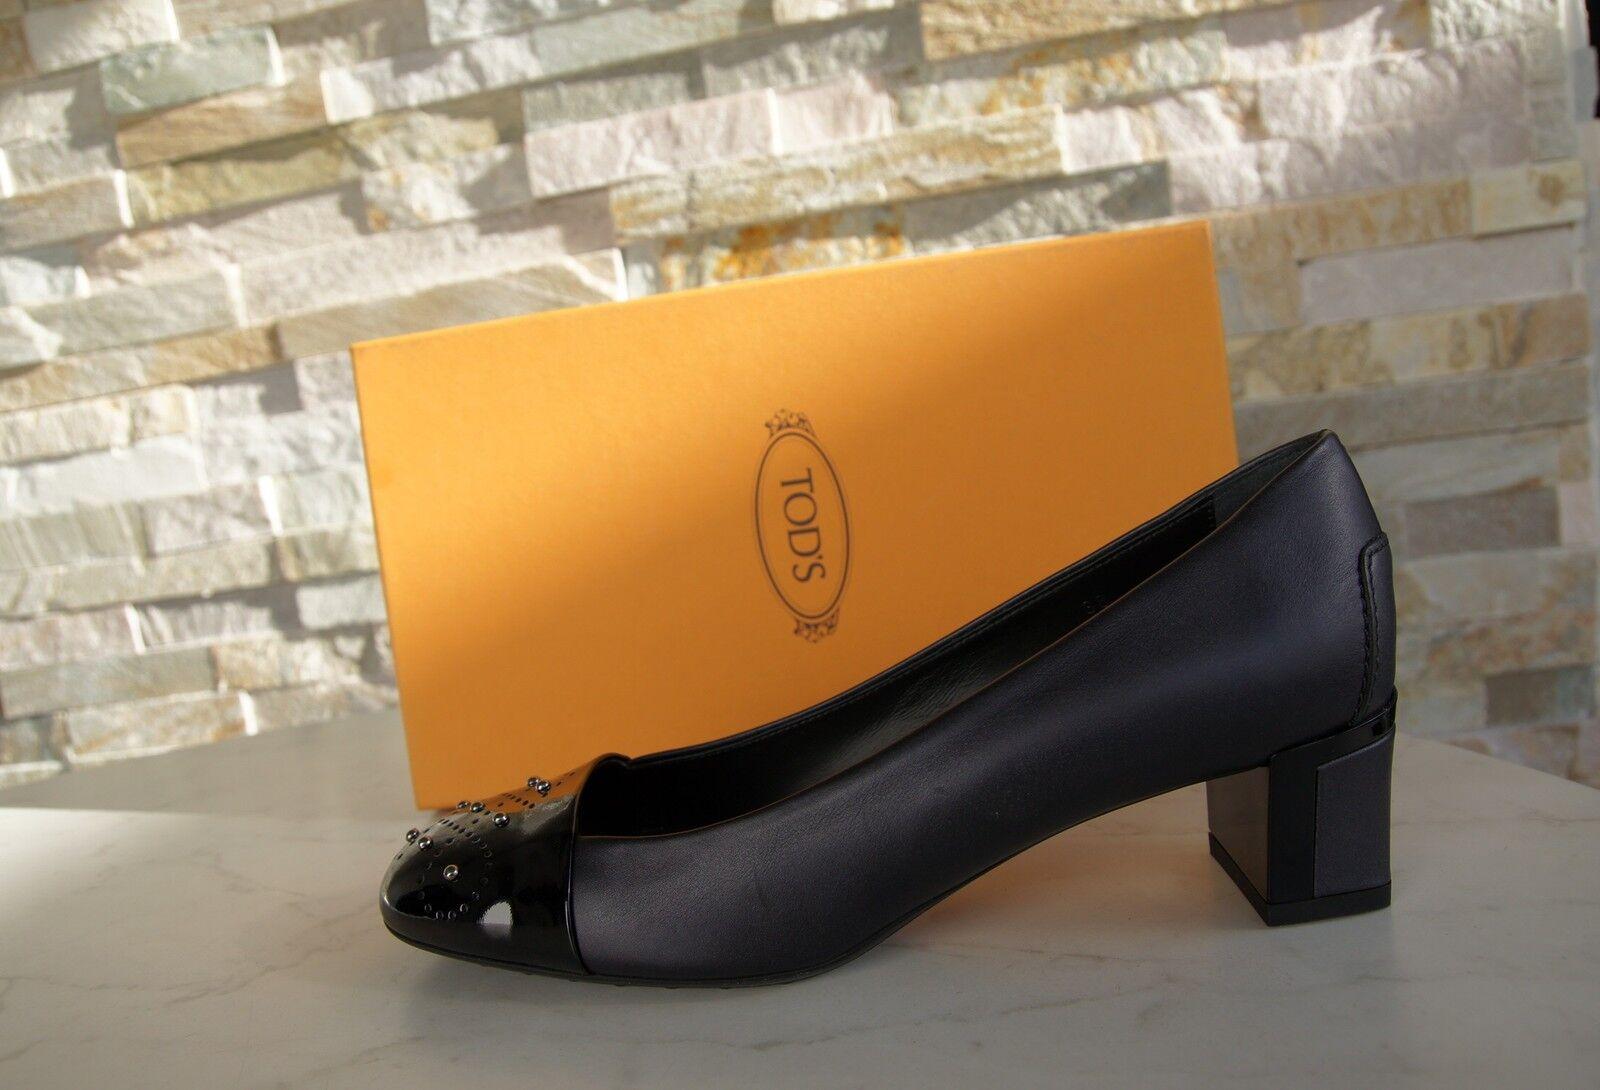 Tods Tod ´ S 38 Escarpins Chaussures Basses Chaussures Penture Rivets Penture Chaussures Noir Neuf 9abf6f